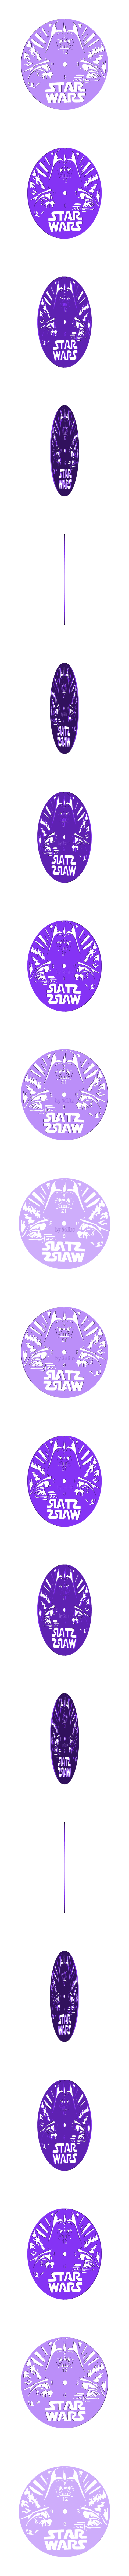 Reloj_Star_wars_vl.stl Download free STL file Reloj Star Wars Darth Vader • 3D printer object, 3dlito